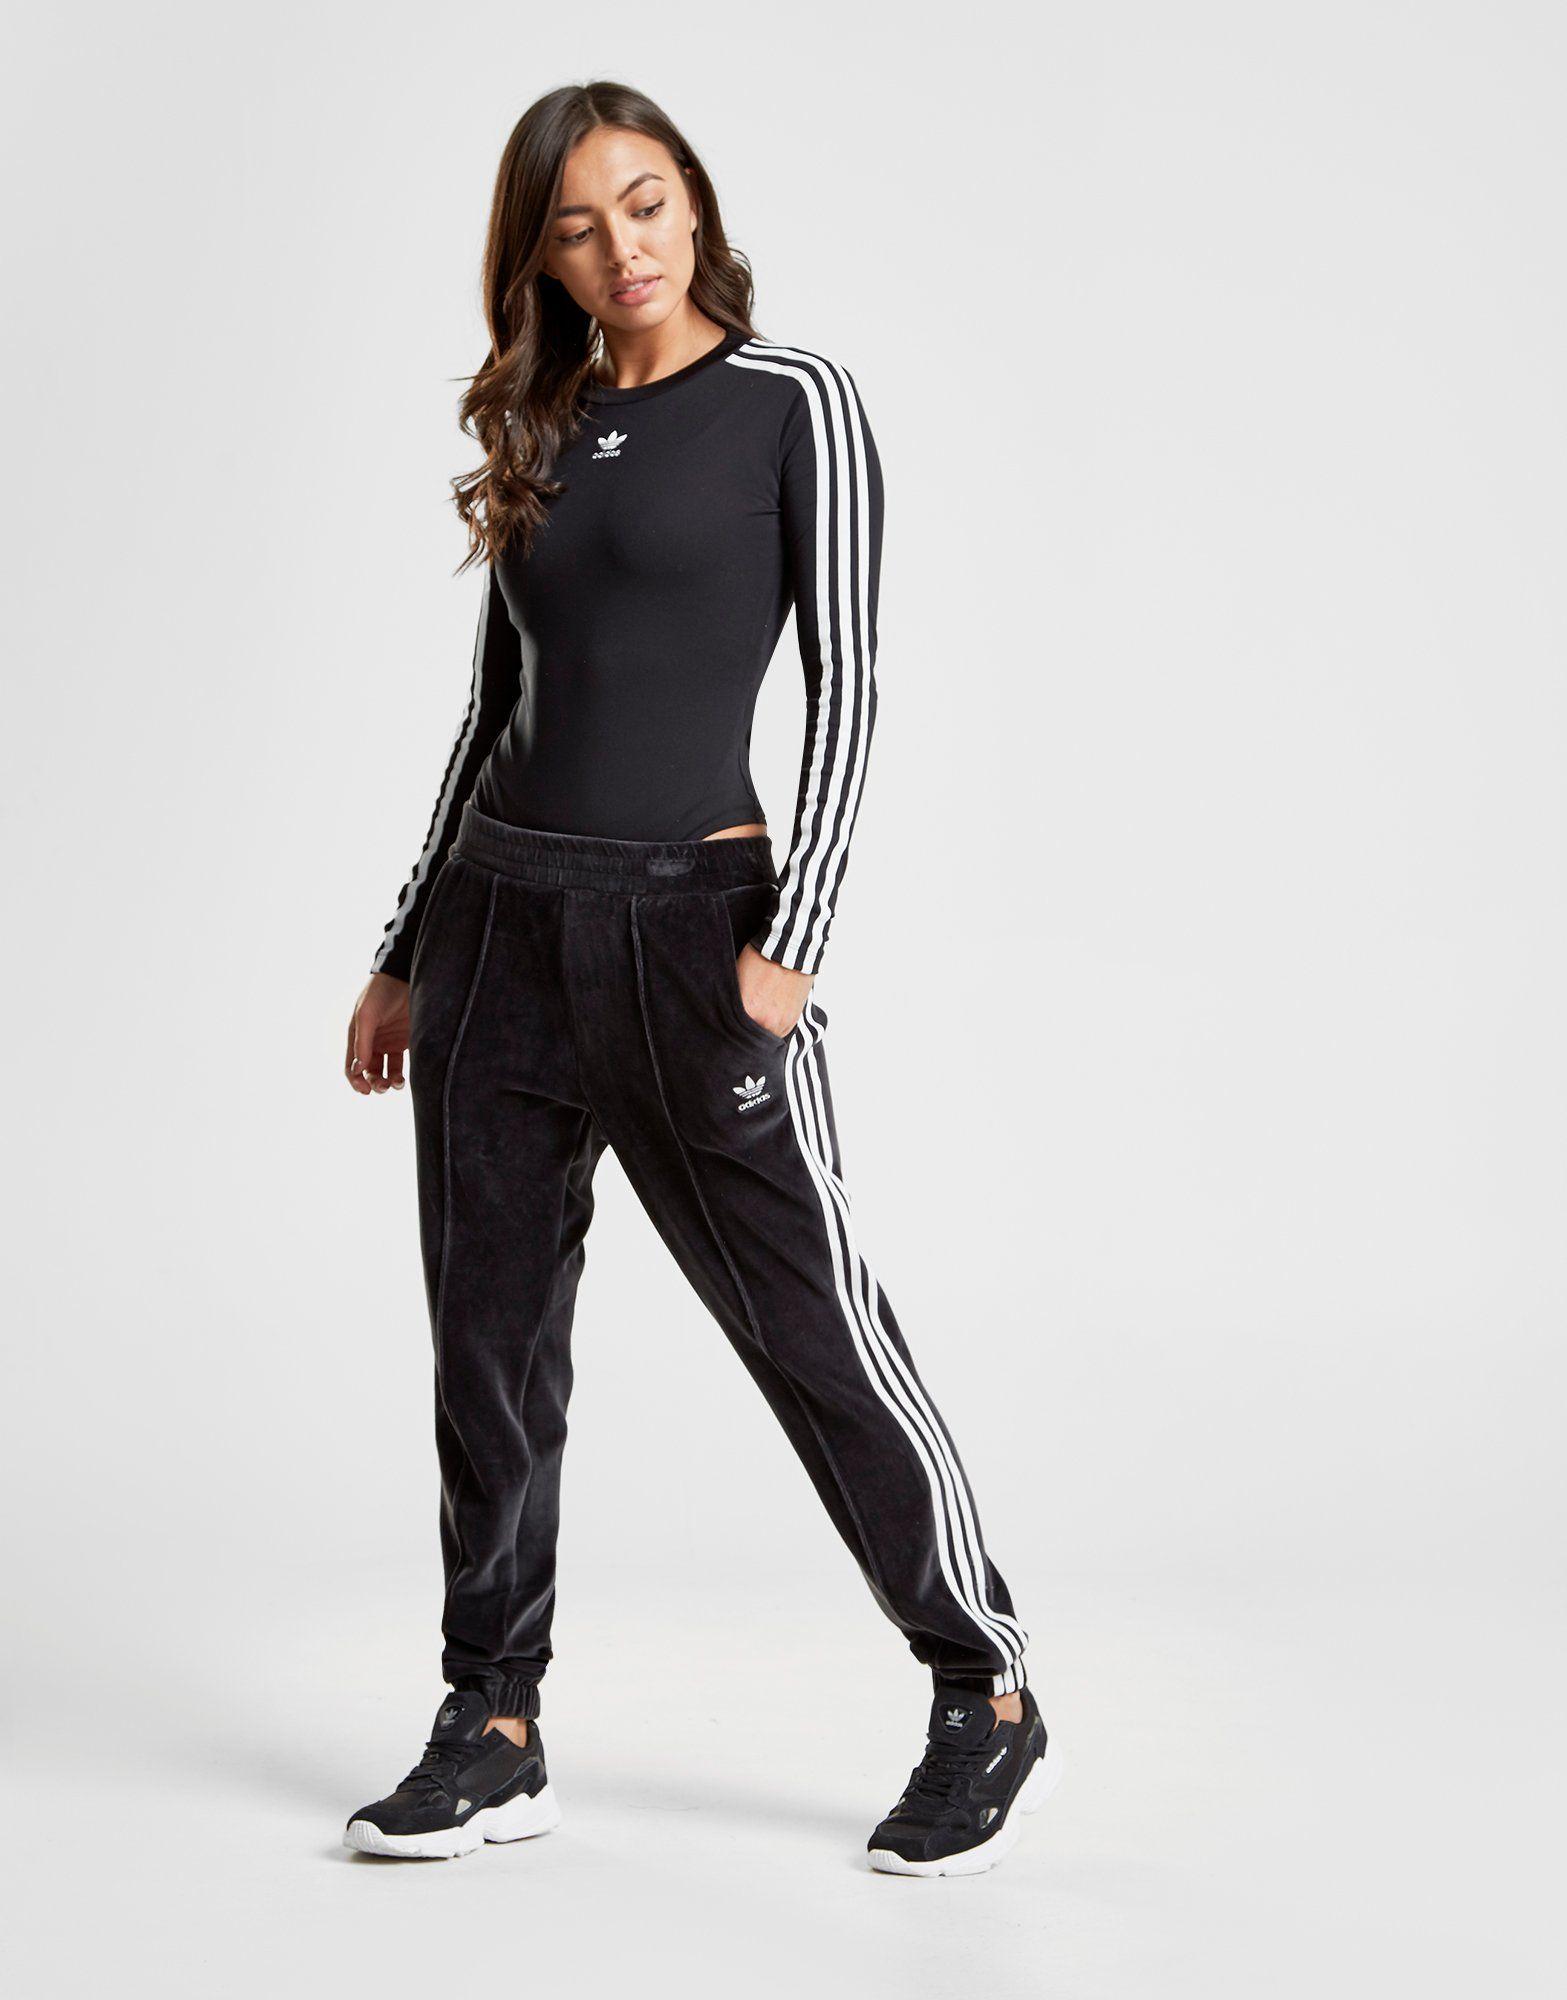 Adidas Originals 3 Stripes Long Sleeve Bodysuit Jd Sports